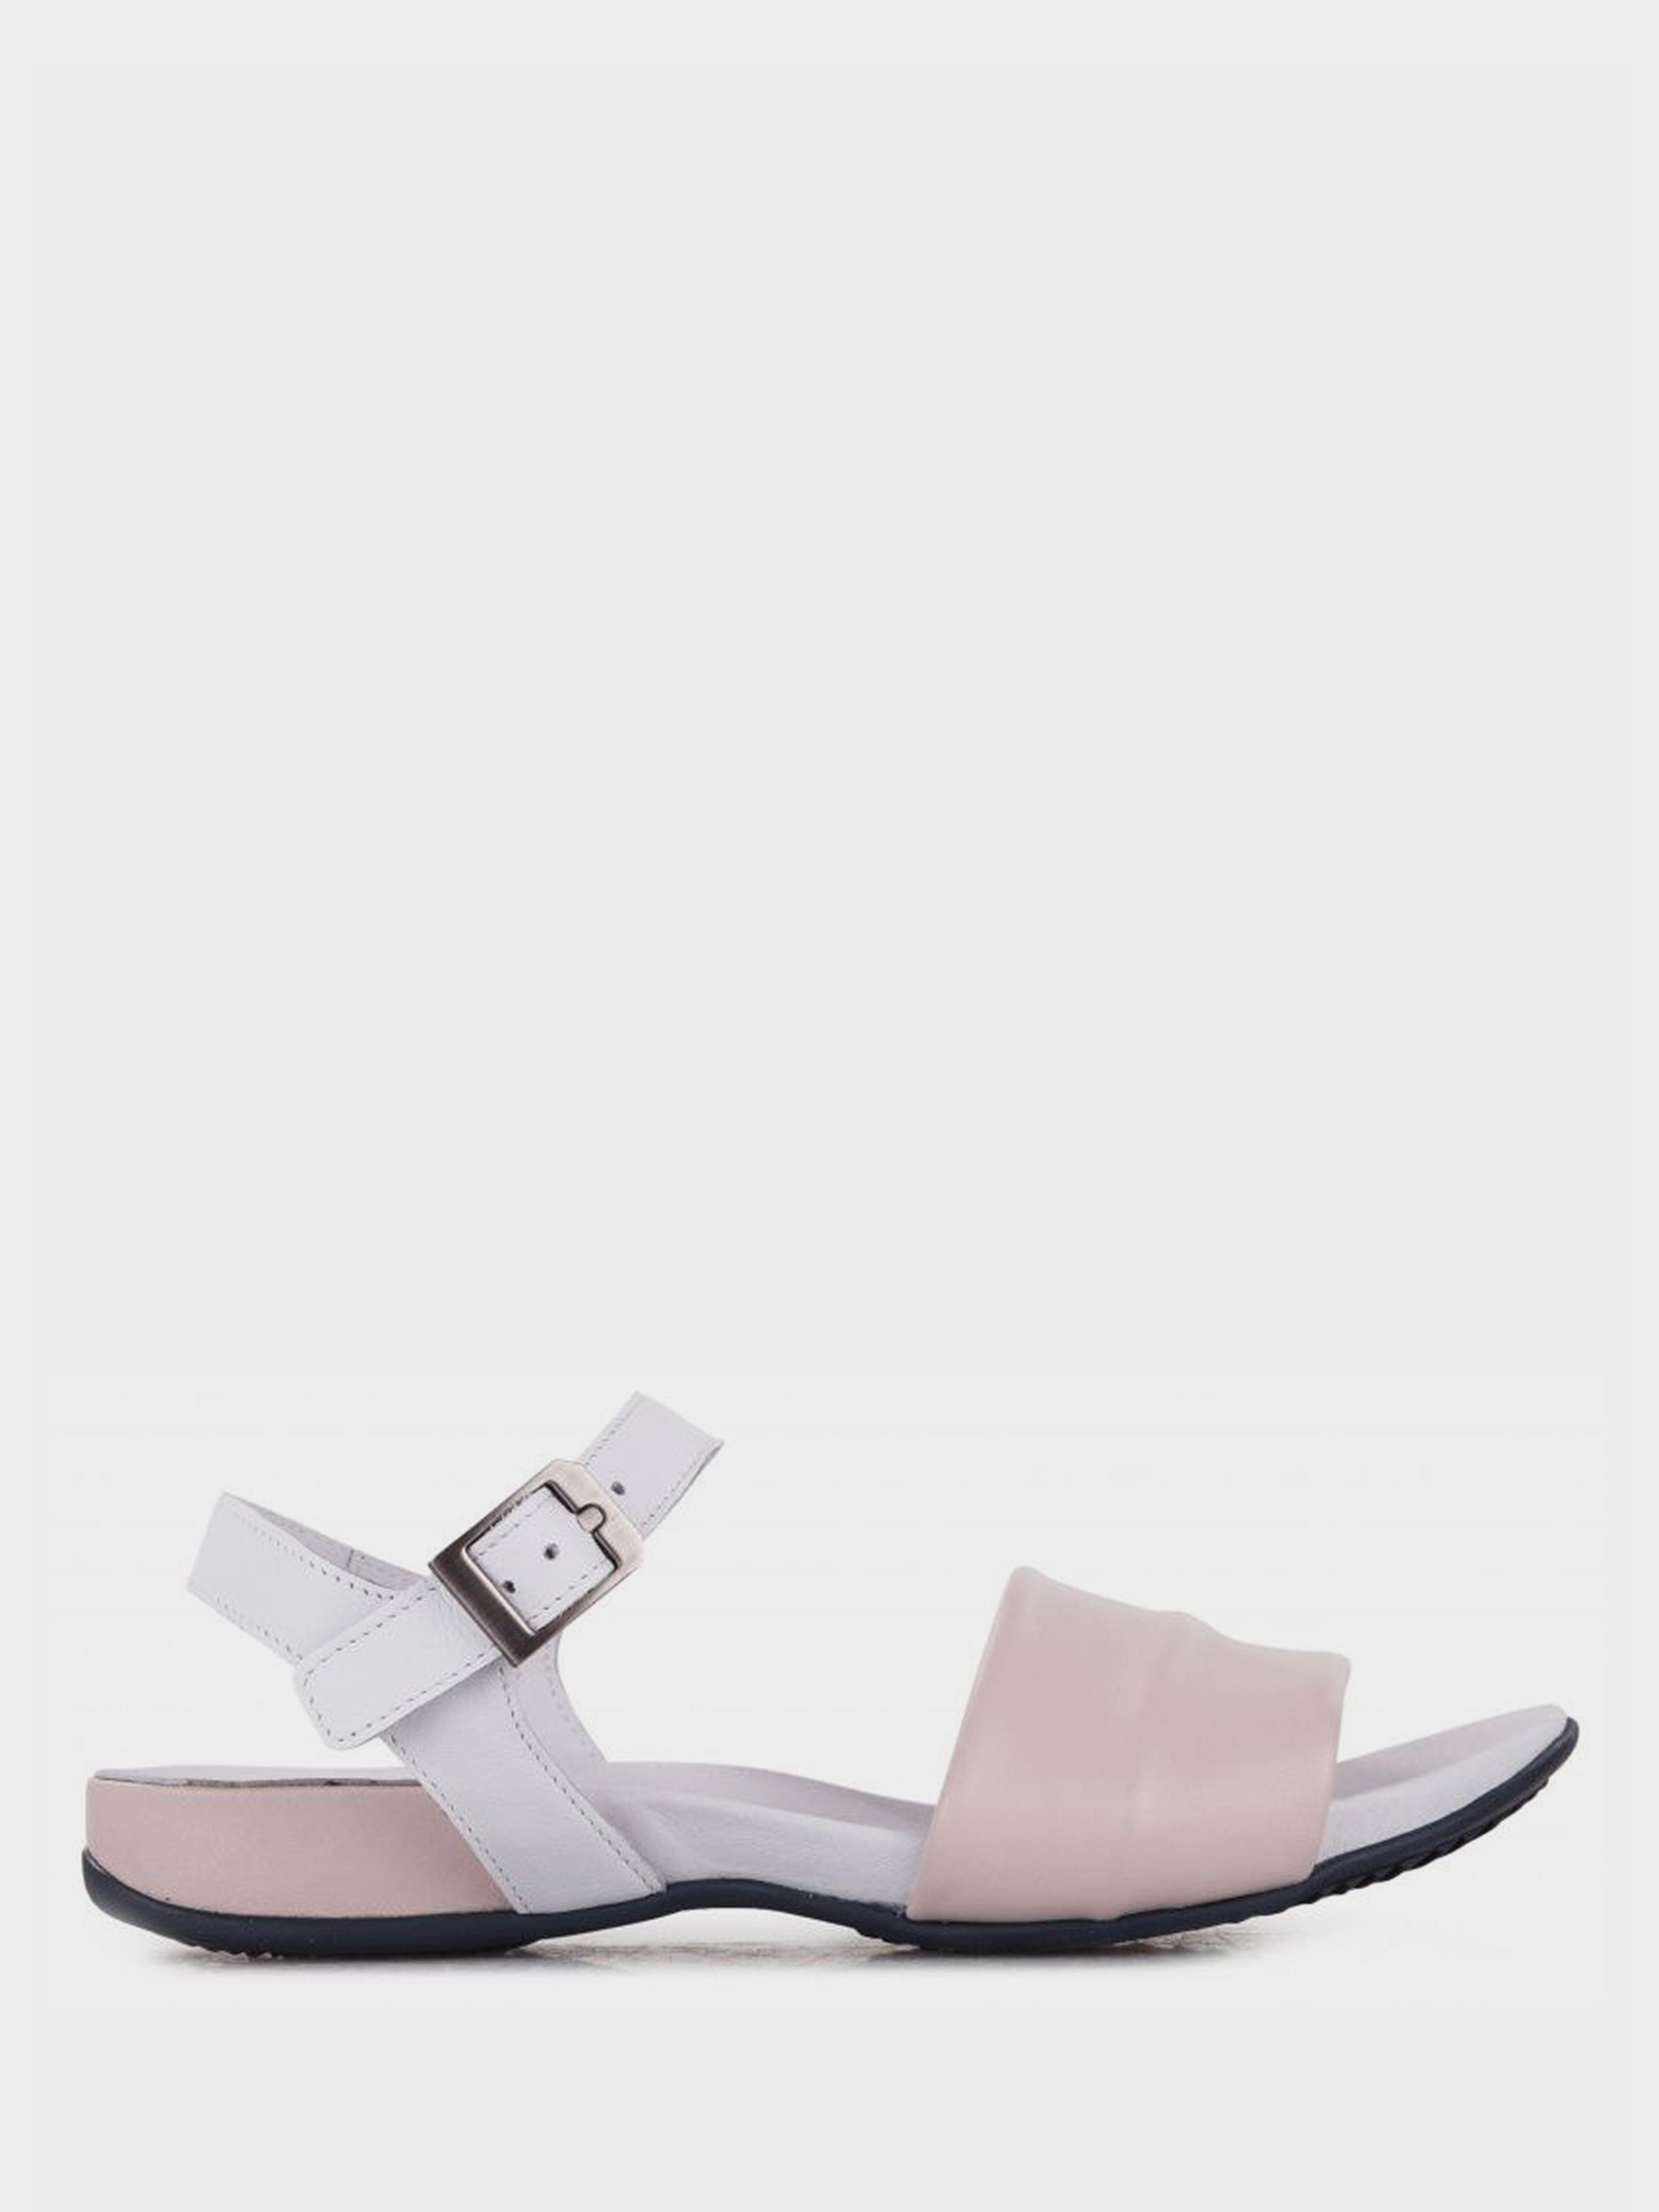 Сандалі  для жінок Стептер 6444-3 розмірна сітка взуття, 2017